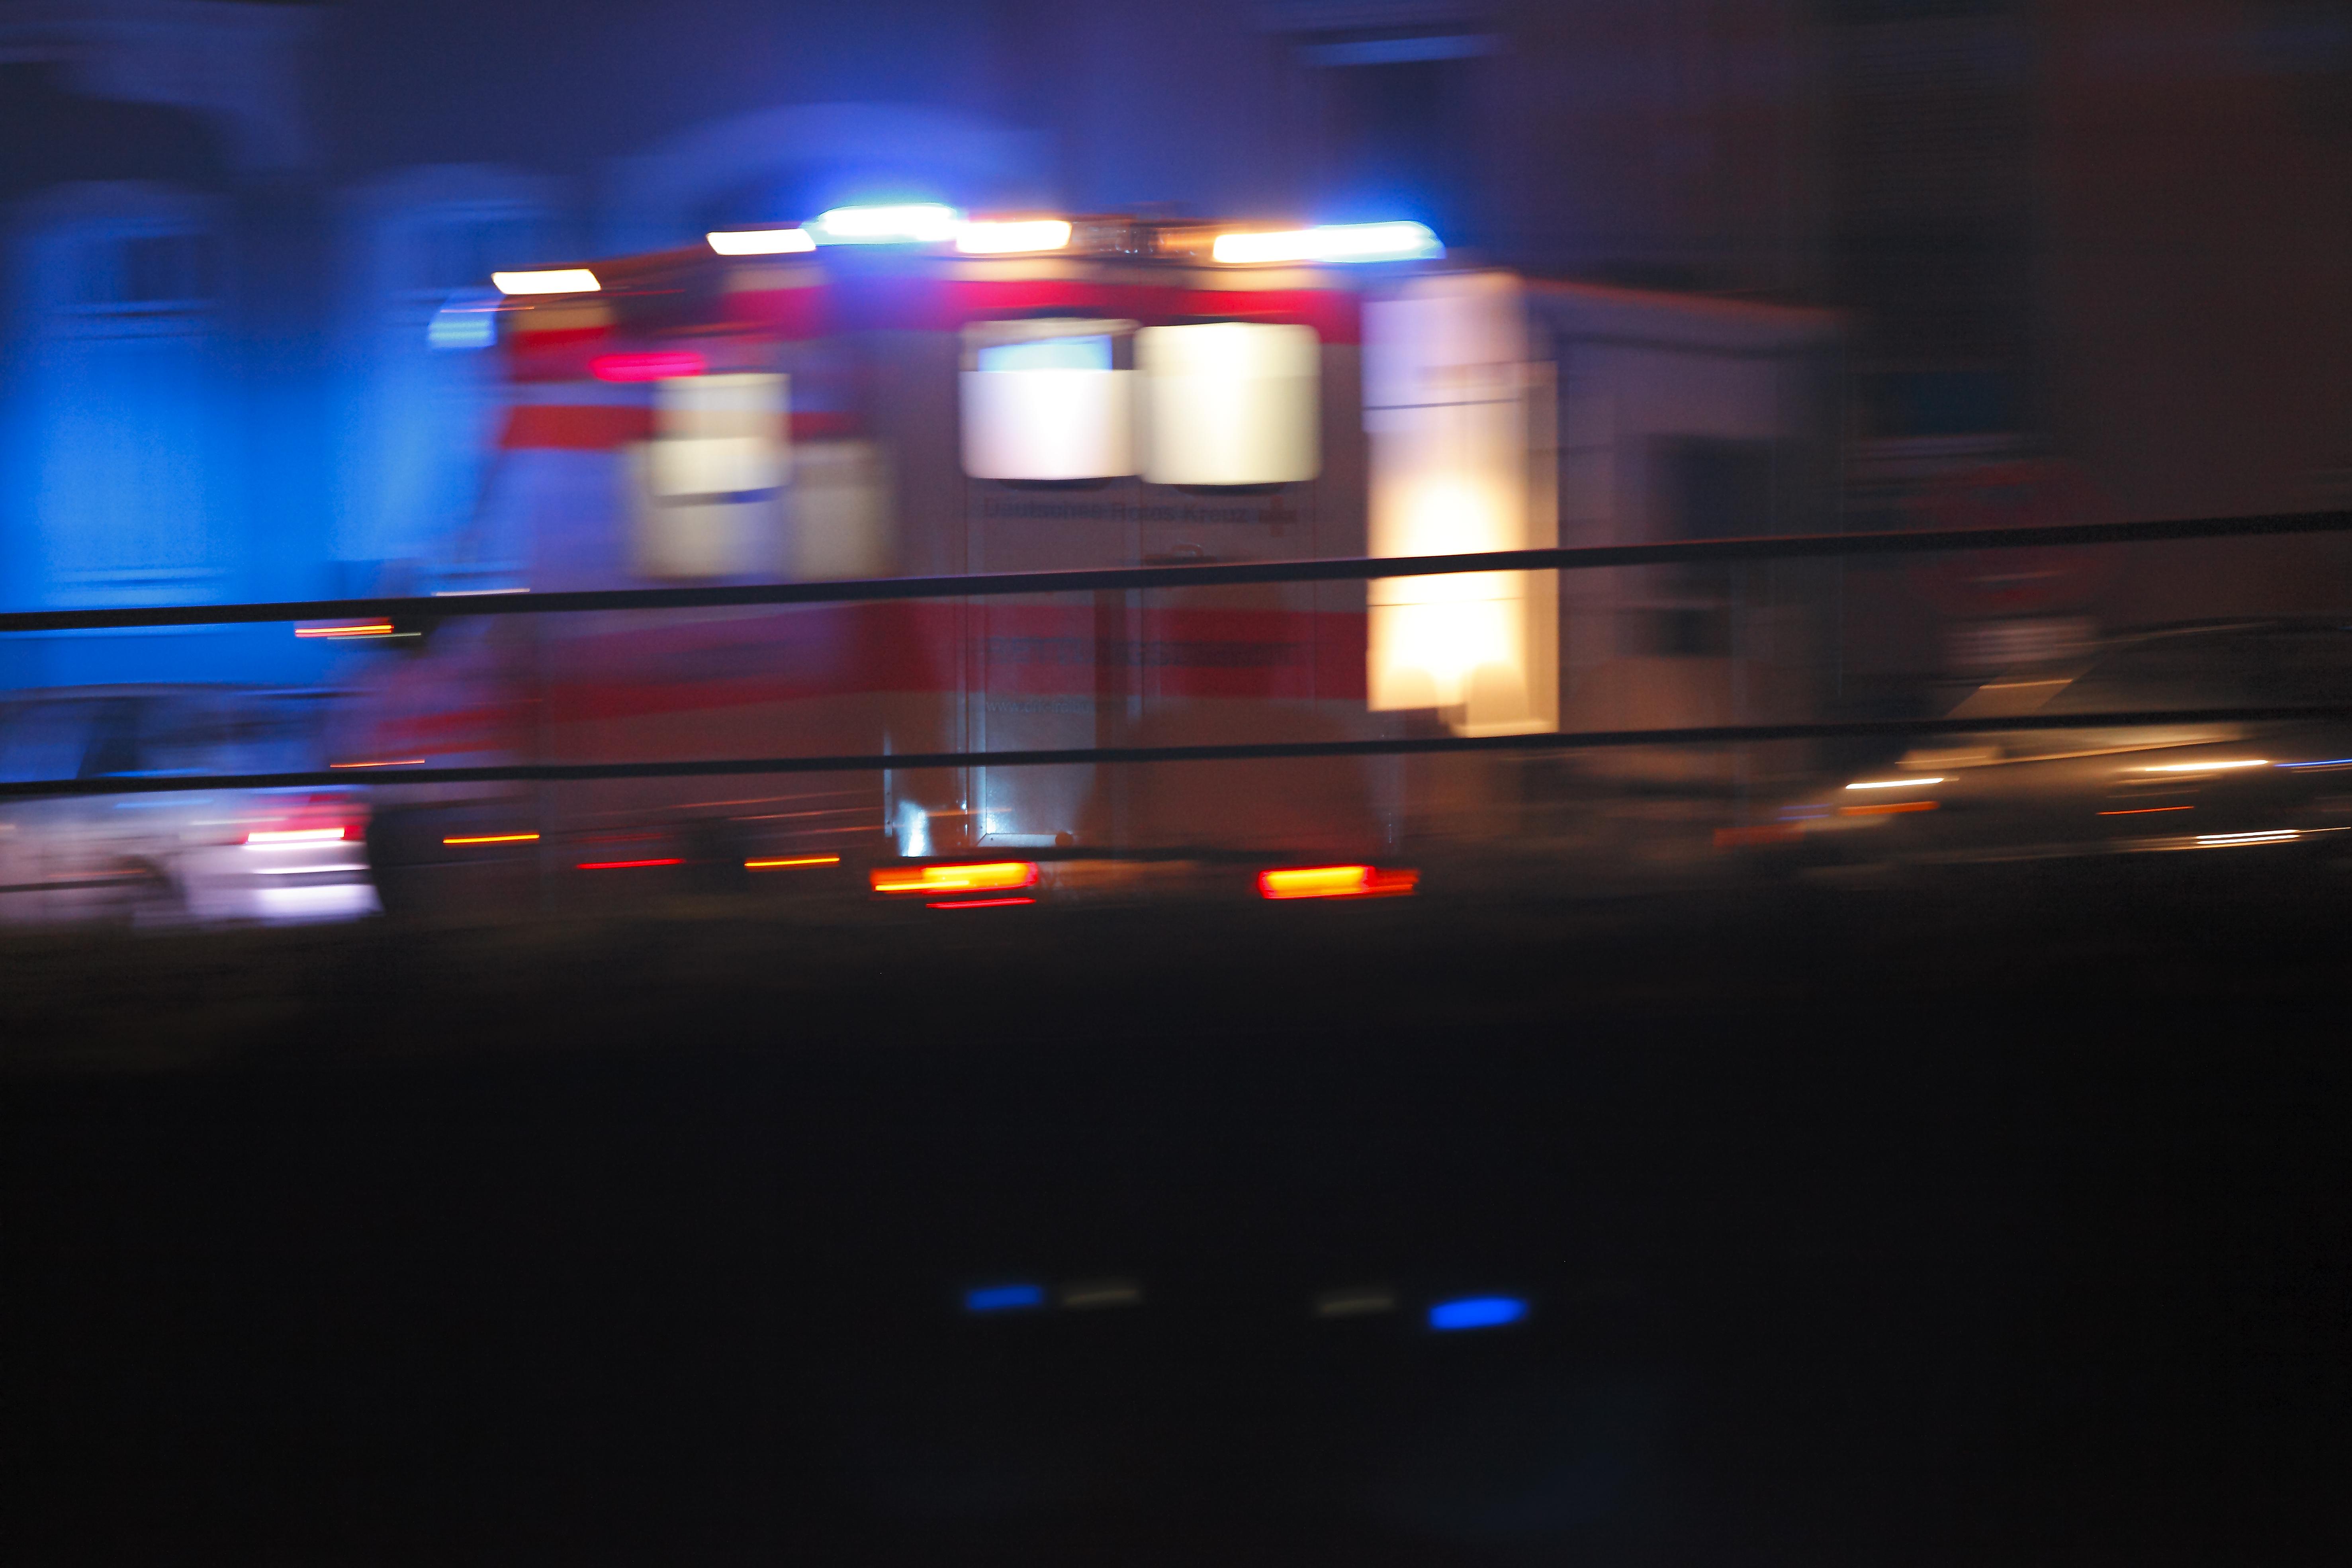 Free Images : ambulance, night lights, car, hurry, mode of